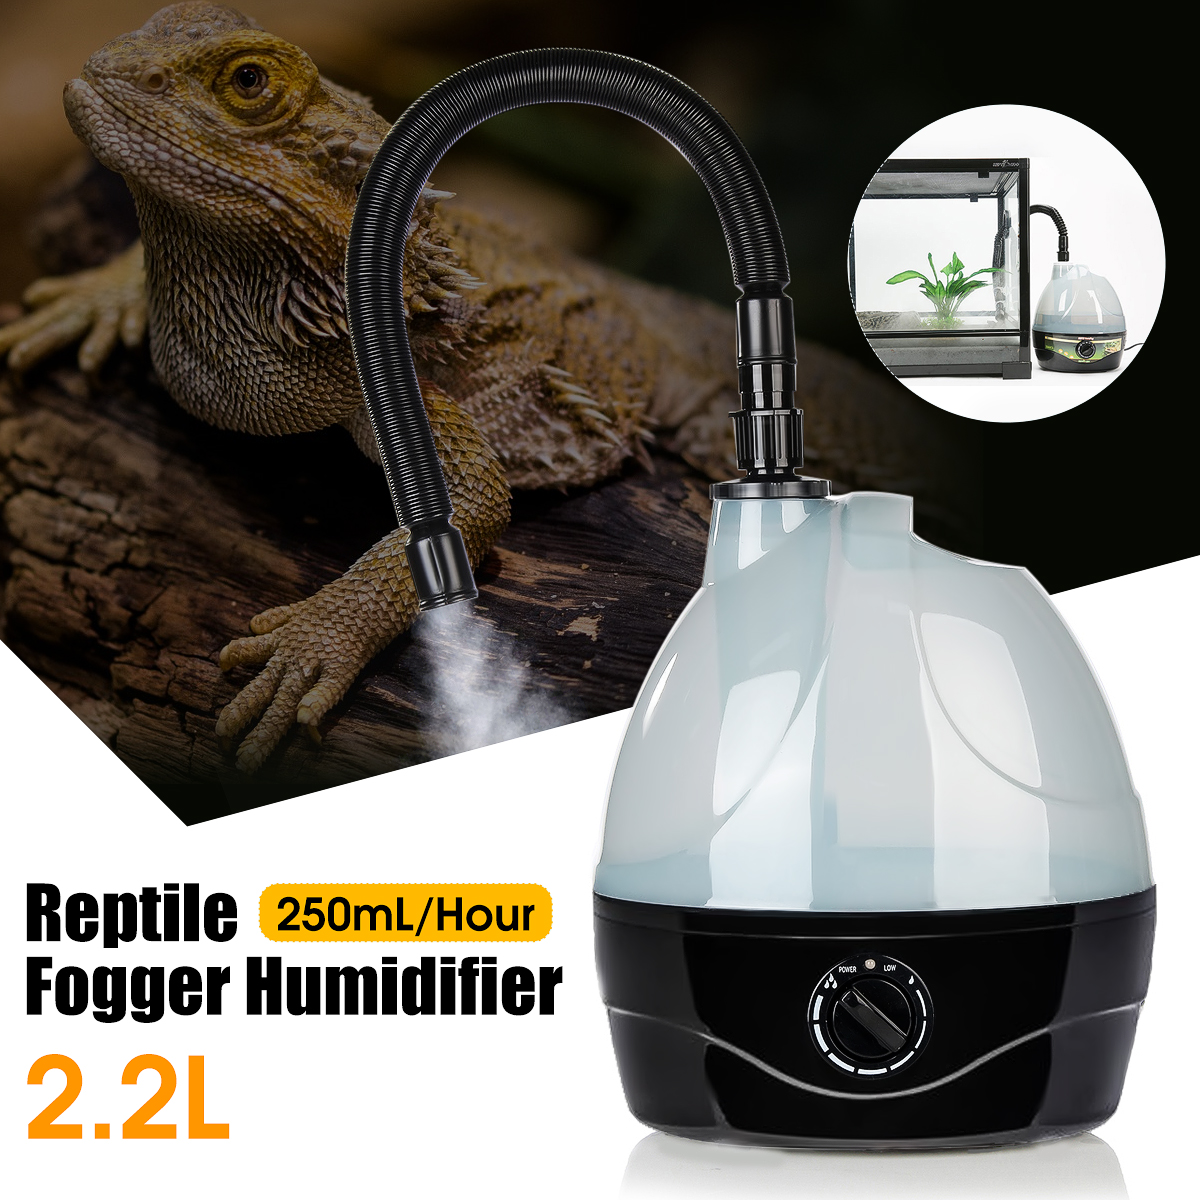 warmtoo NEW 1 pcs Brand New High Quality 2.2L Tank Amphibians Reptile Fogger Humidifier Vaporizer Fog Maker Generator